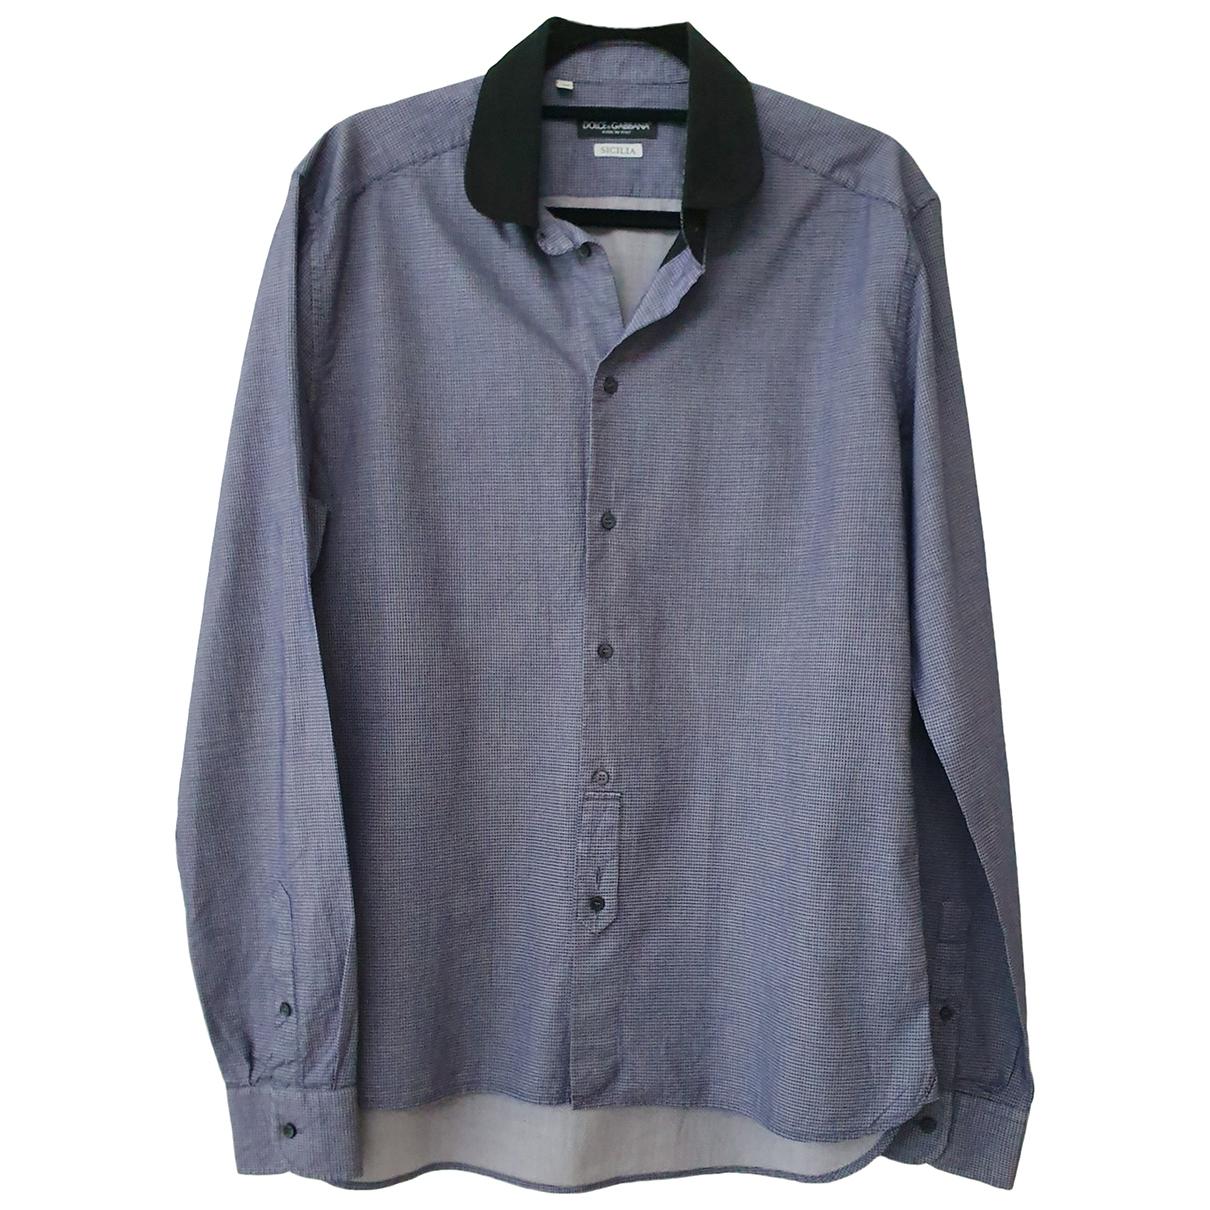 Dolce & Gabbana \N Navy Cotton Shirts for Men 16.5 UK - US (tour de cou / collar)